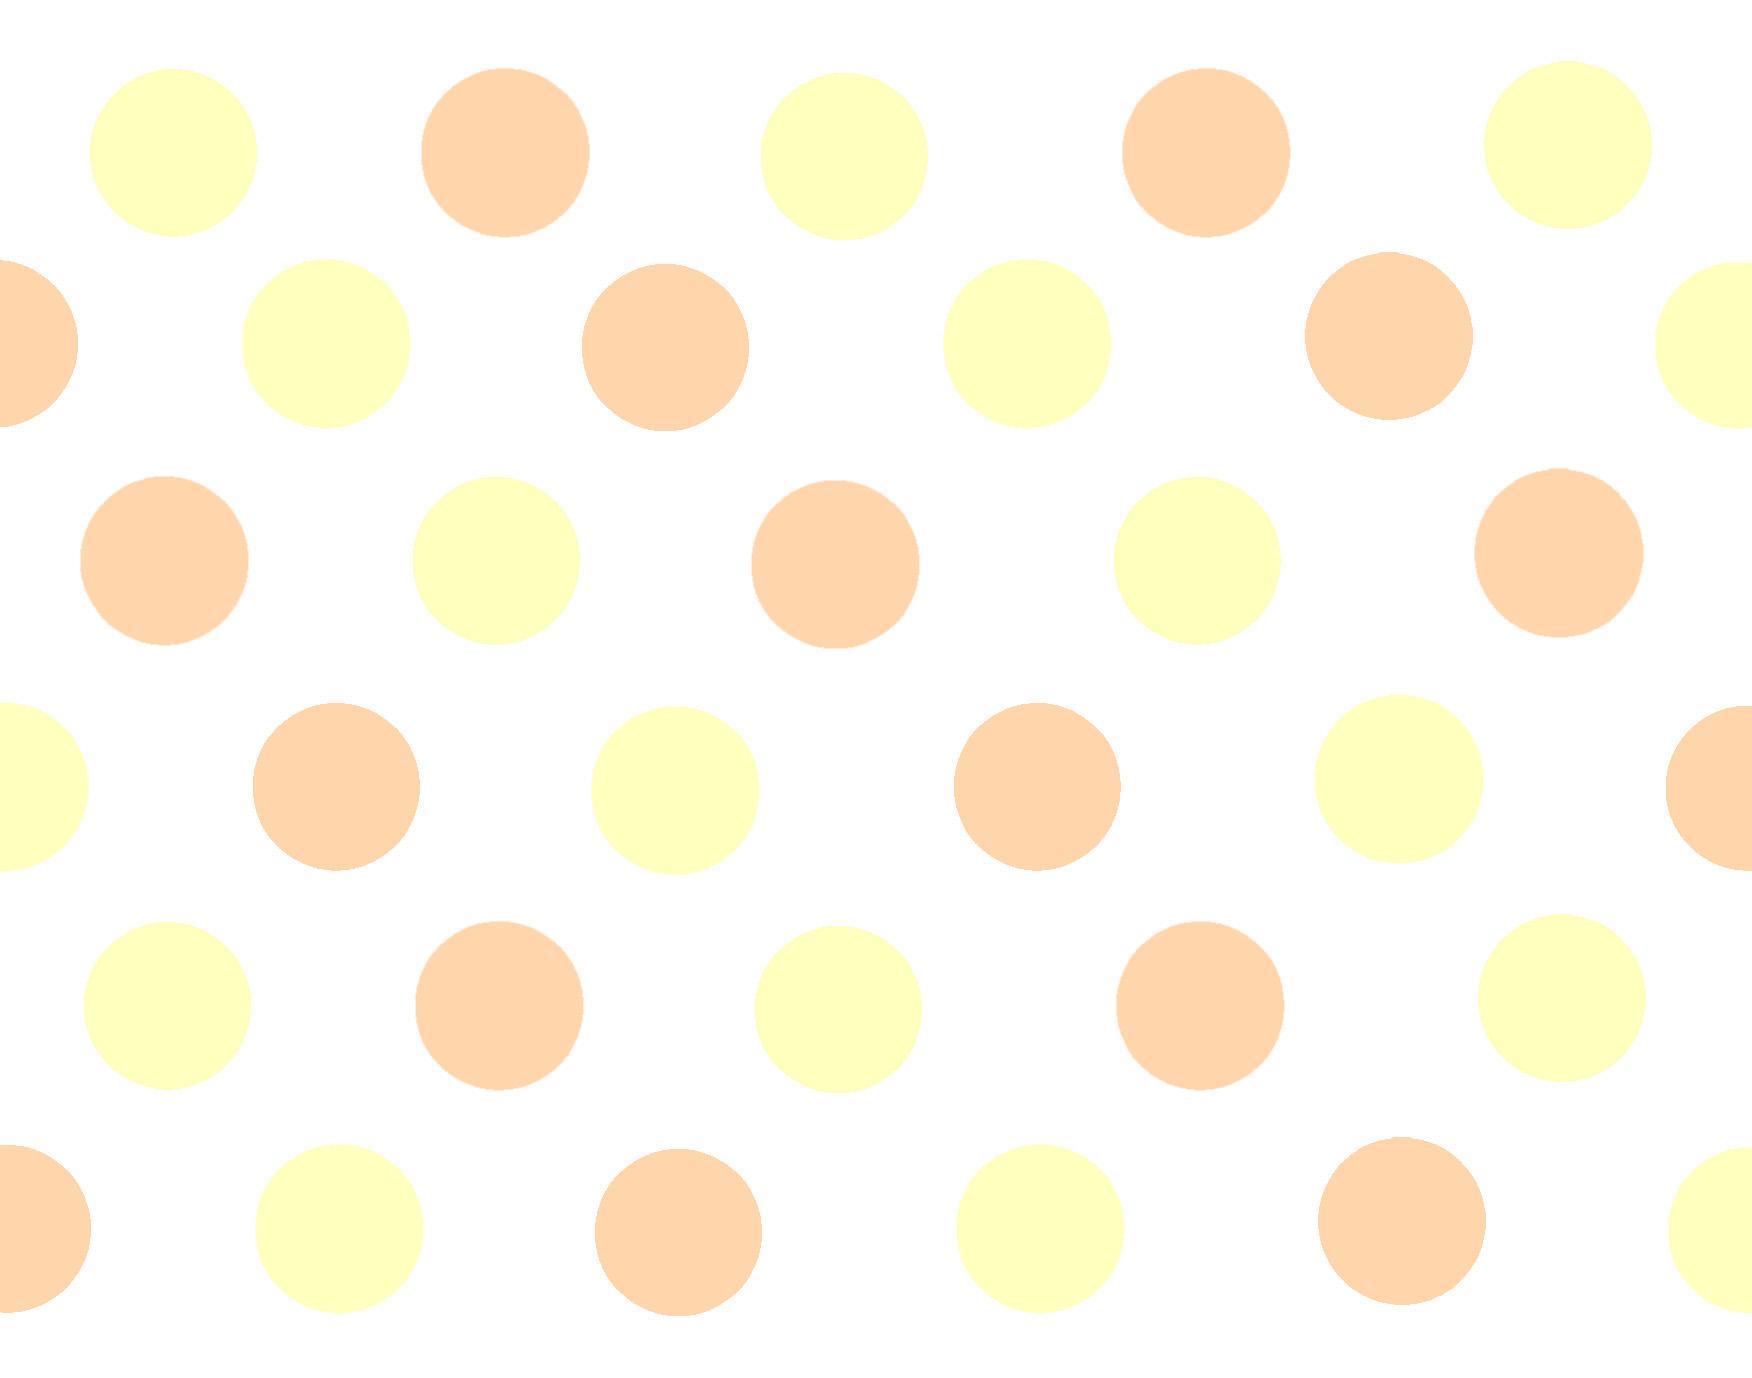 Yellow Polka Dot Wallpaper Wallpapersafari